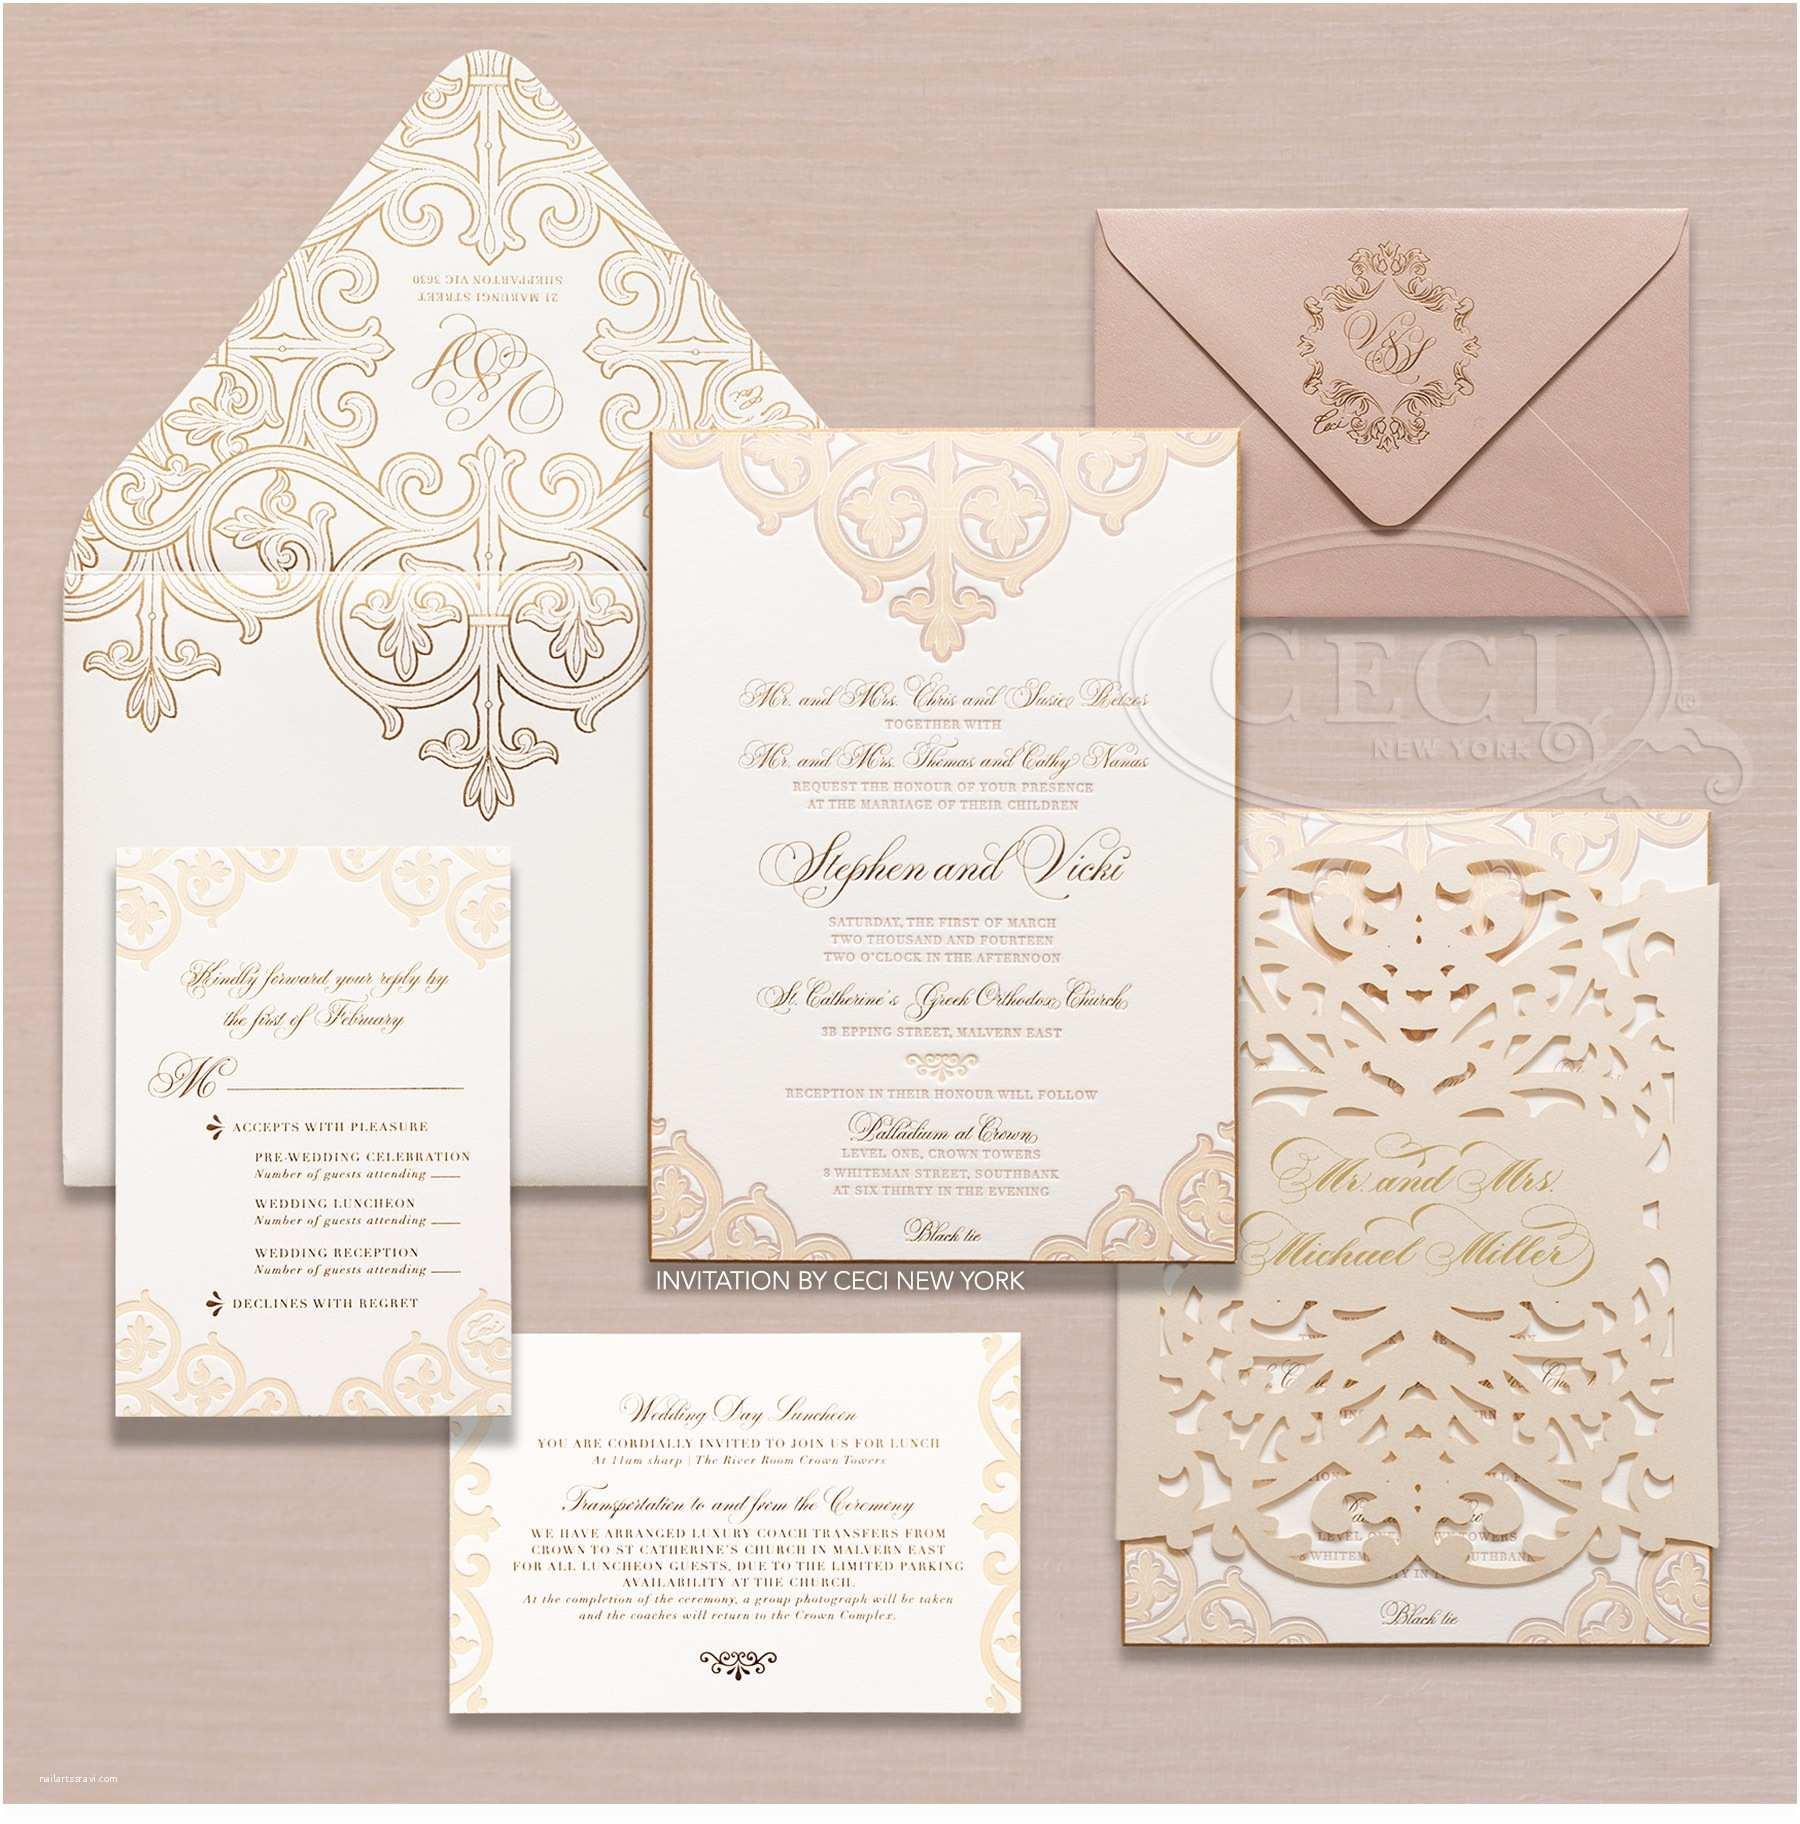 Luxury Wedding Invitations Luxury Wedding Invitations for Elegance Registaz